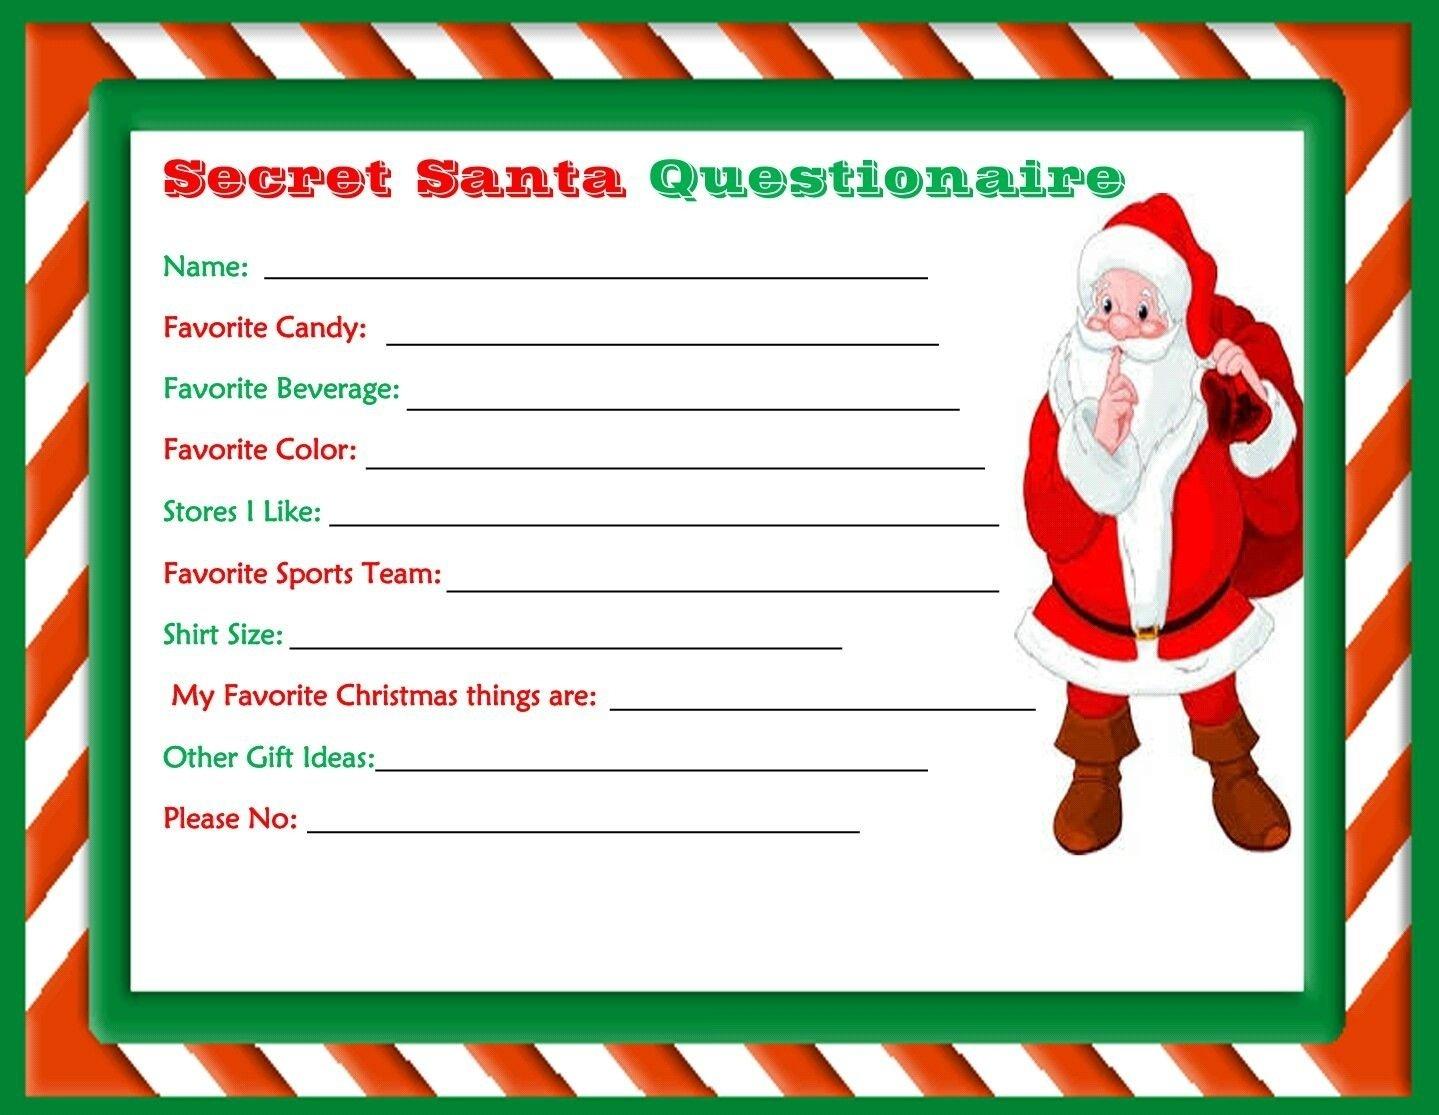 10 Fashionable Secret Santa Gift Exchange Ideas printable secret santa questionaire made dollie wolford 1